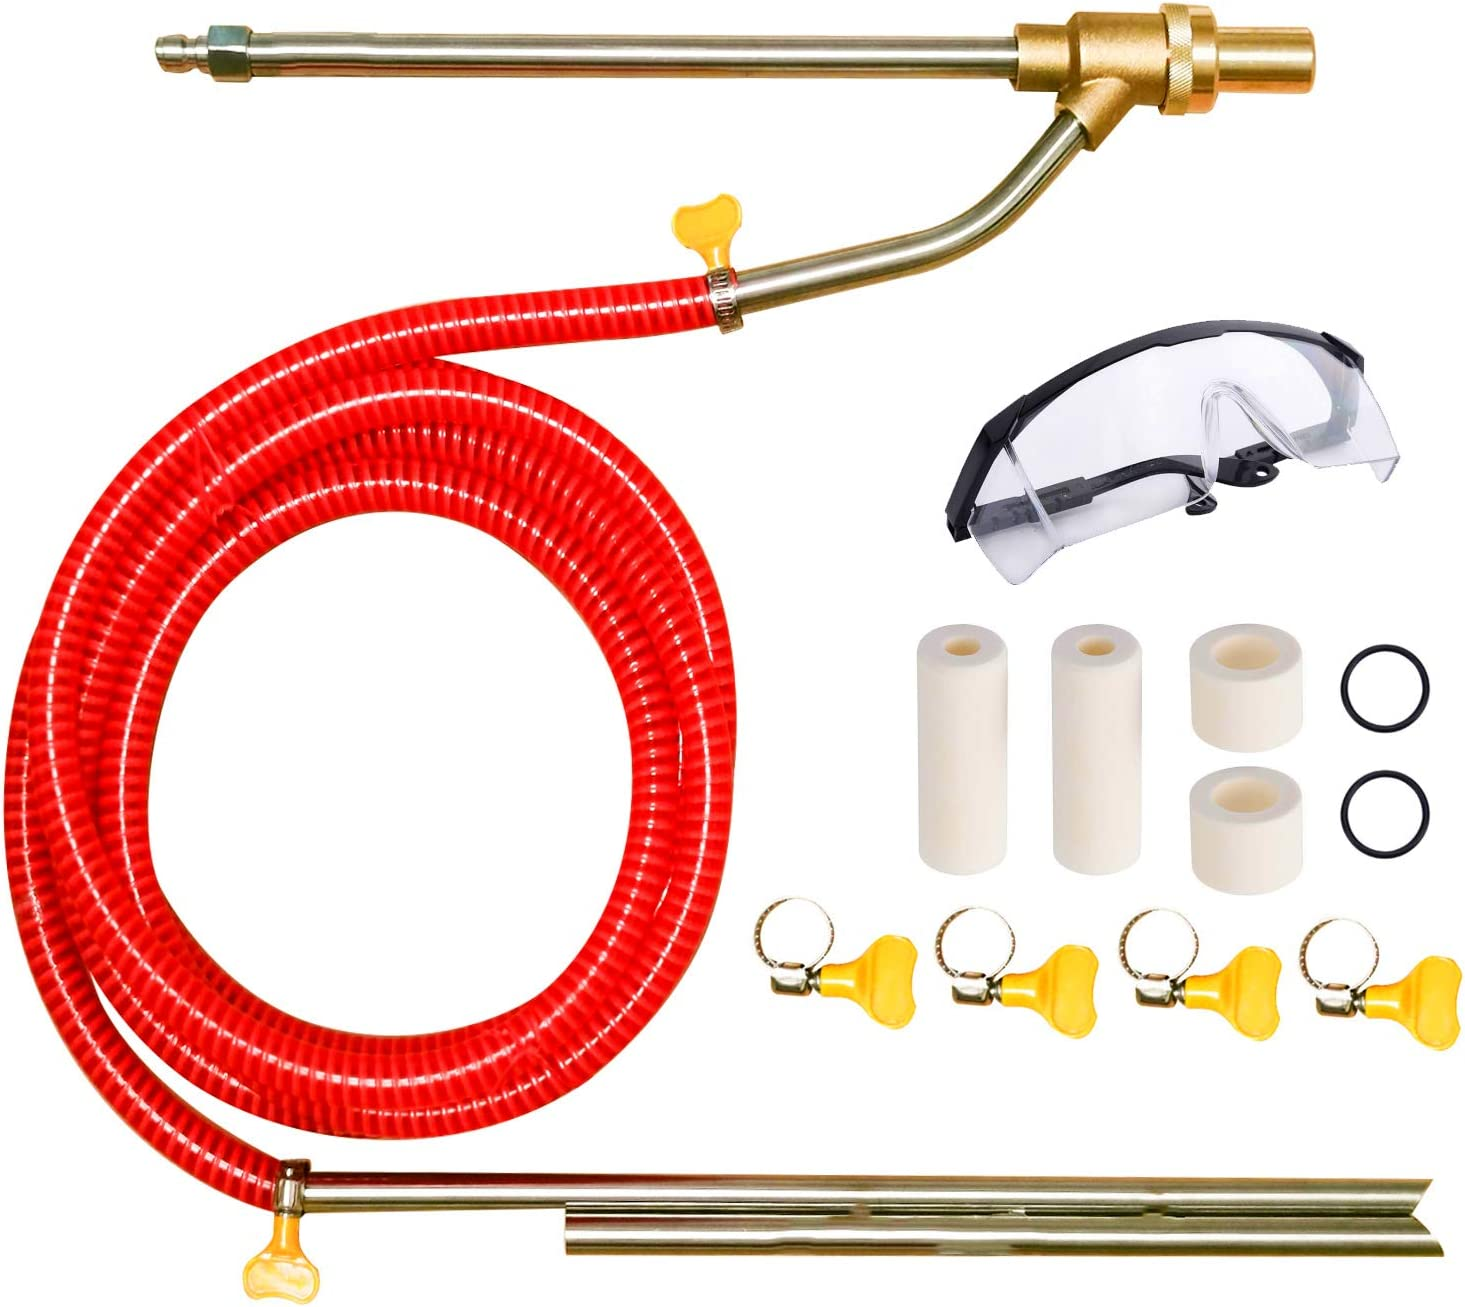 Karcher HD pressure washer compatible M22 Female SANDBLASTING ATTACHMENT KIT